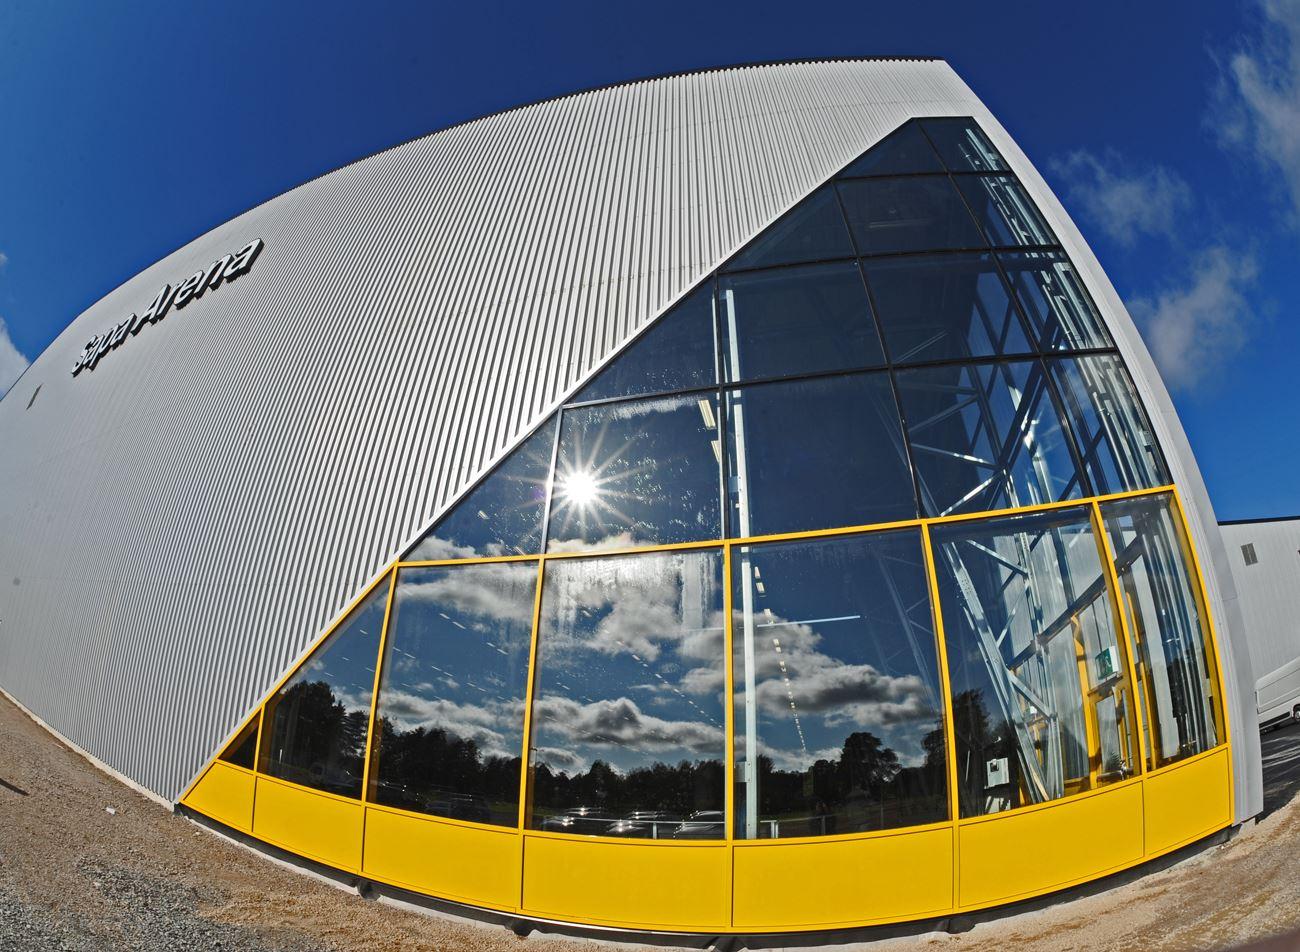 © Vetlanda Turistbyrå, Sapa Arena